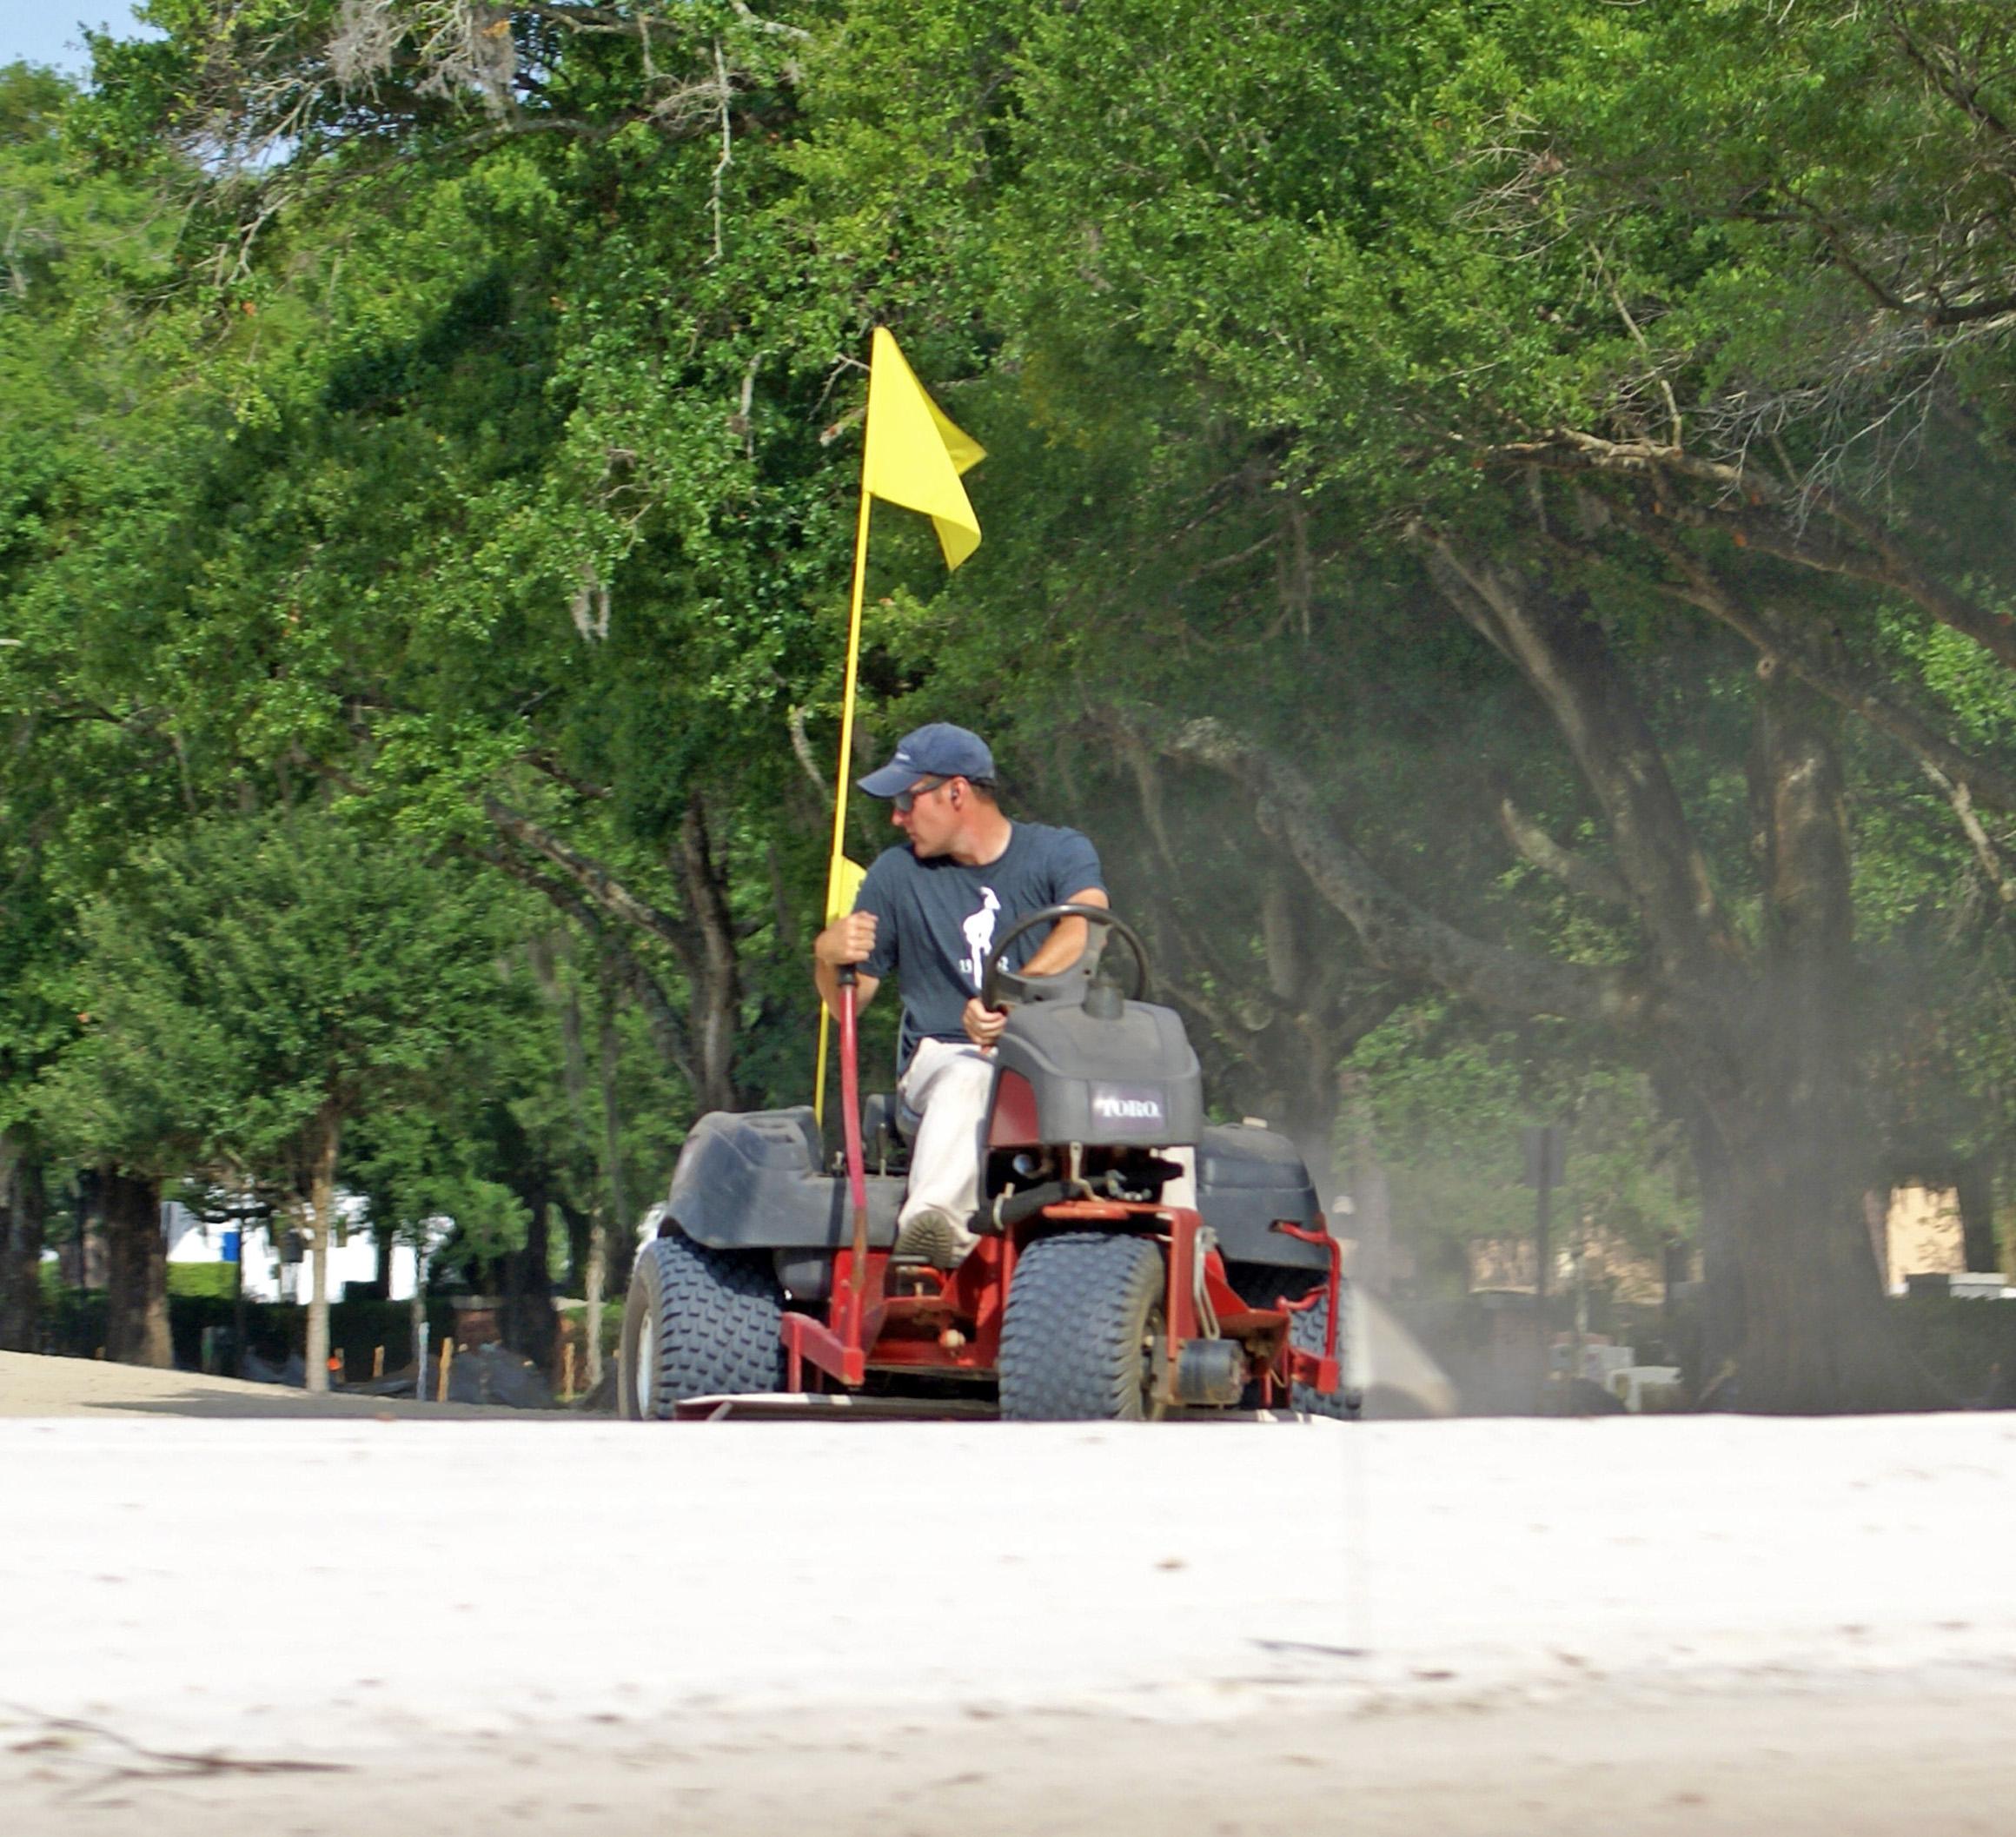 Keith Rhebb - Finish grading No.5 green at Winter Park Golf Course